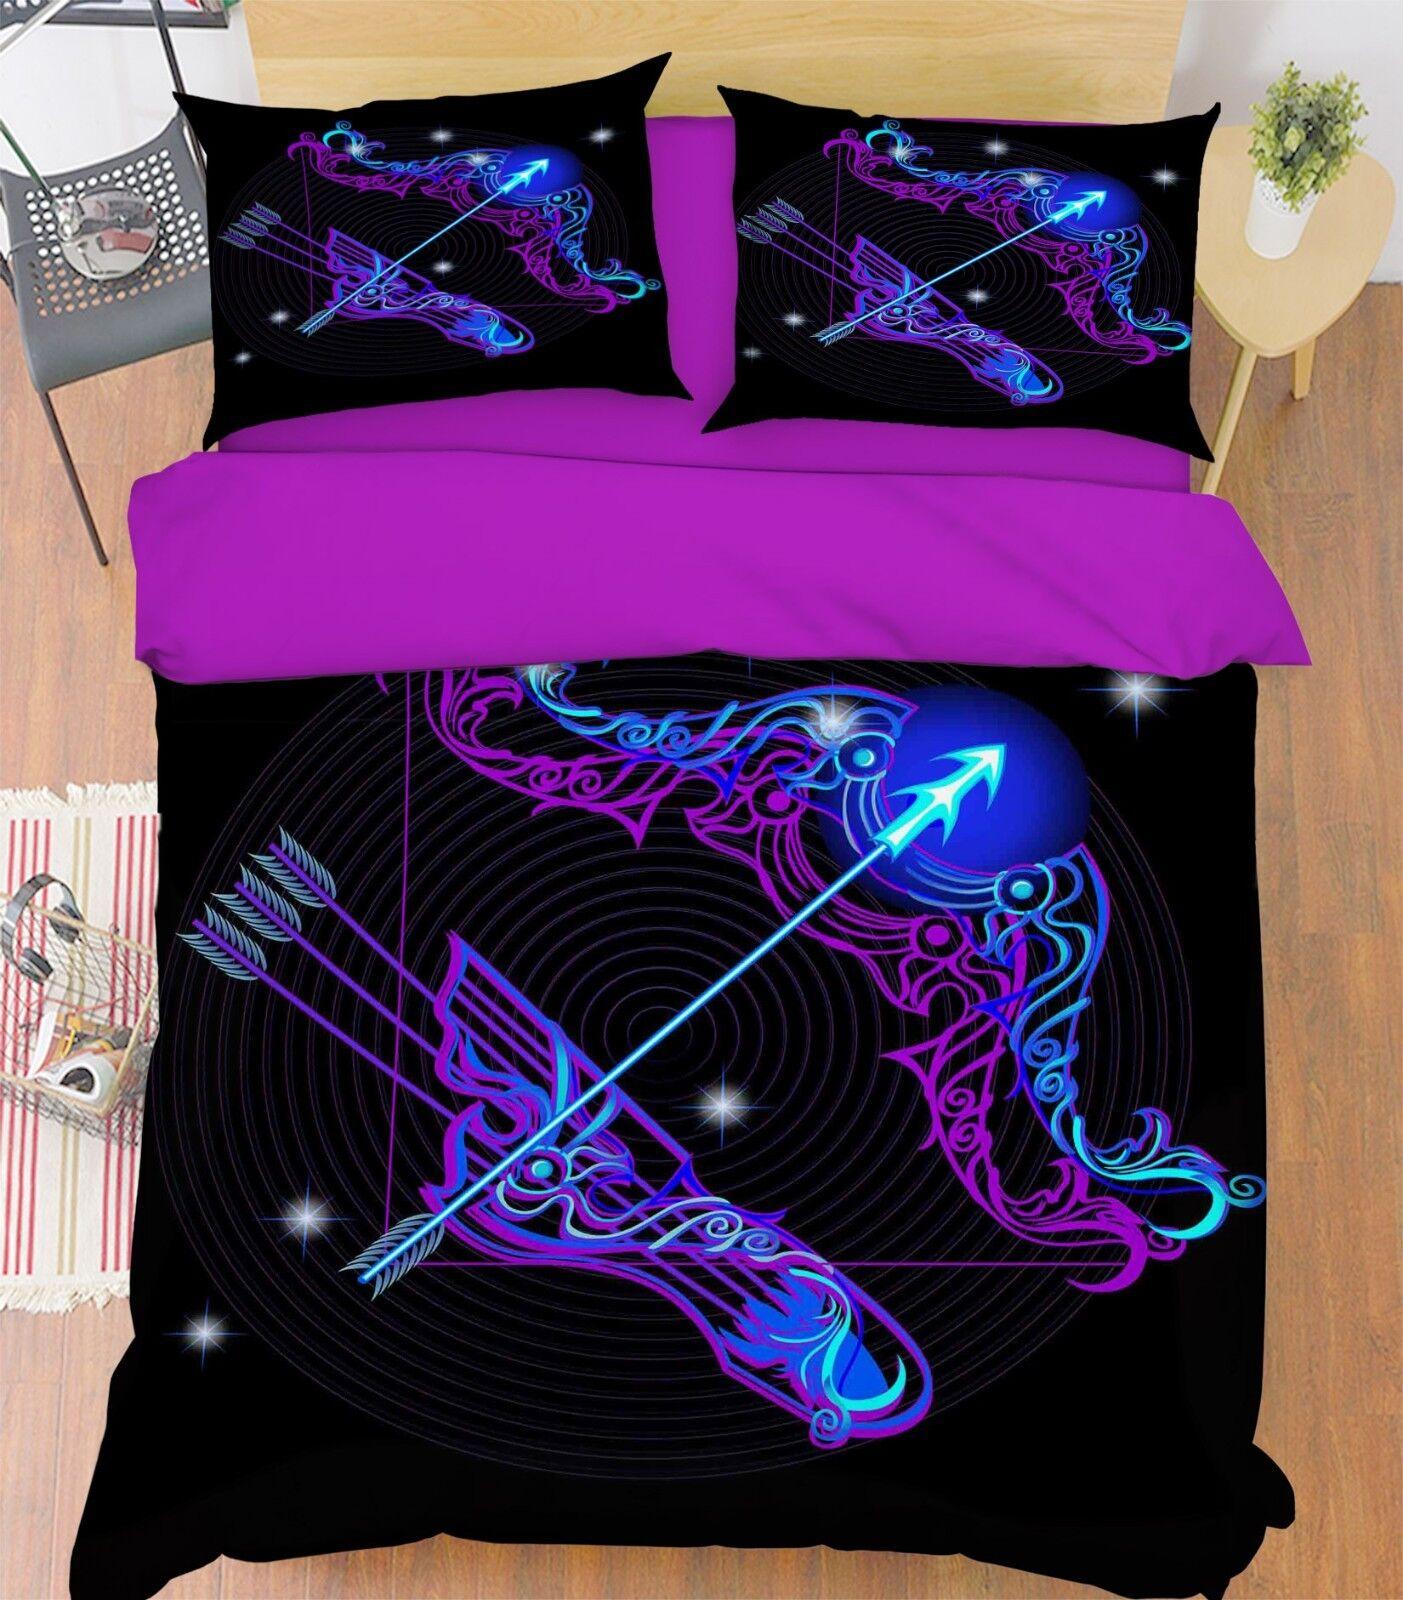 3D Sagittarius 5 Bed Pillowcases Quilt Duvet Cover Set Single Queen King AU Cobb